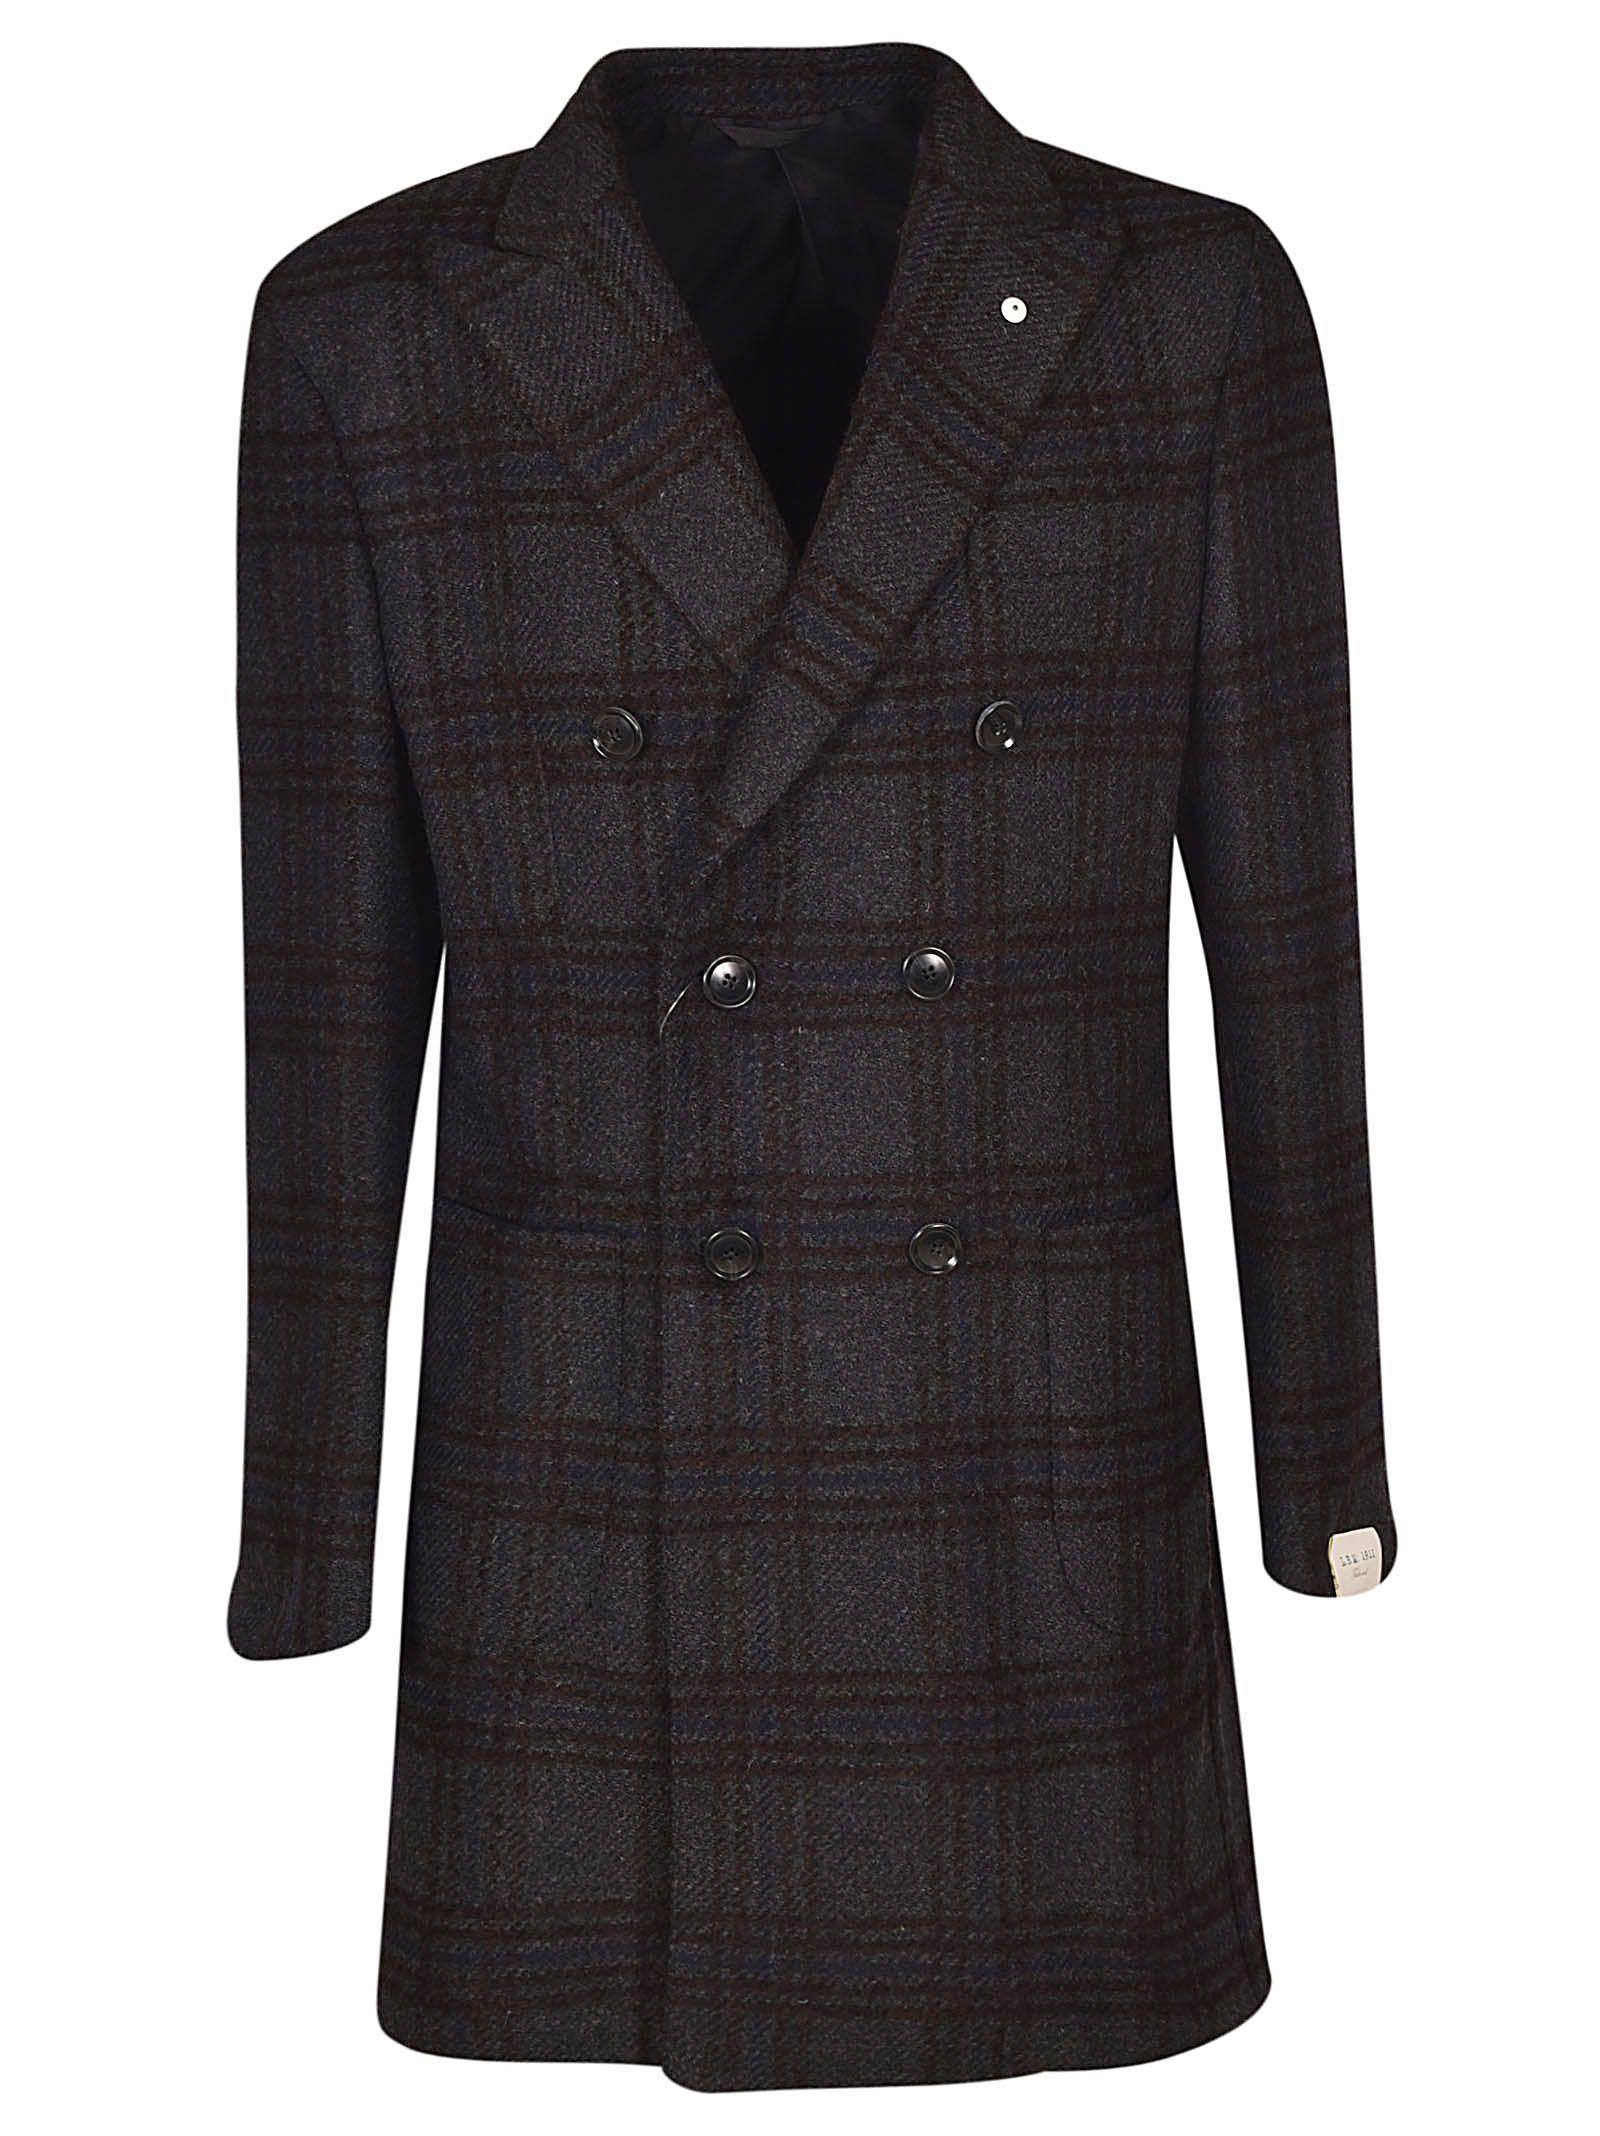 LUIGI BIANCHI MANTOVA Double Breasted Coat in U